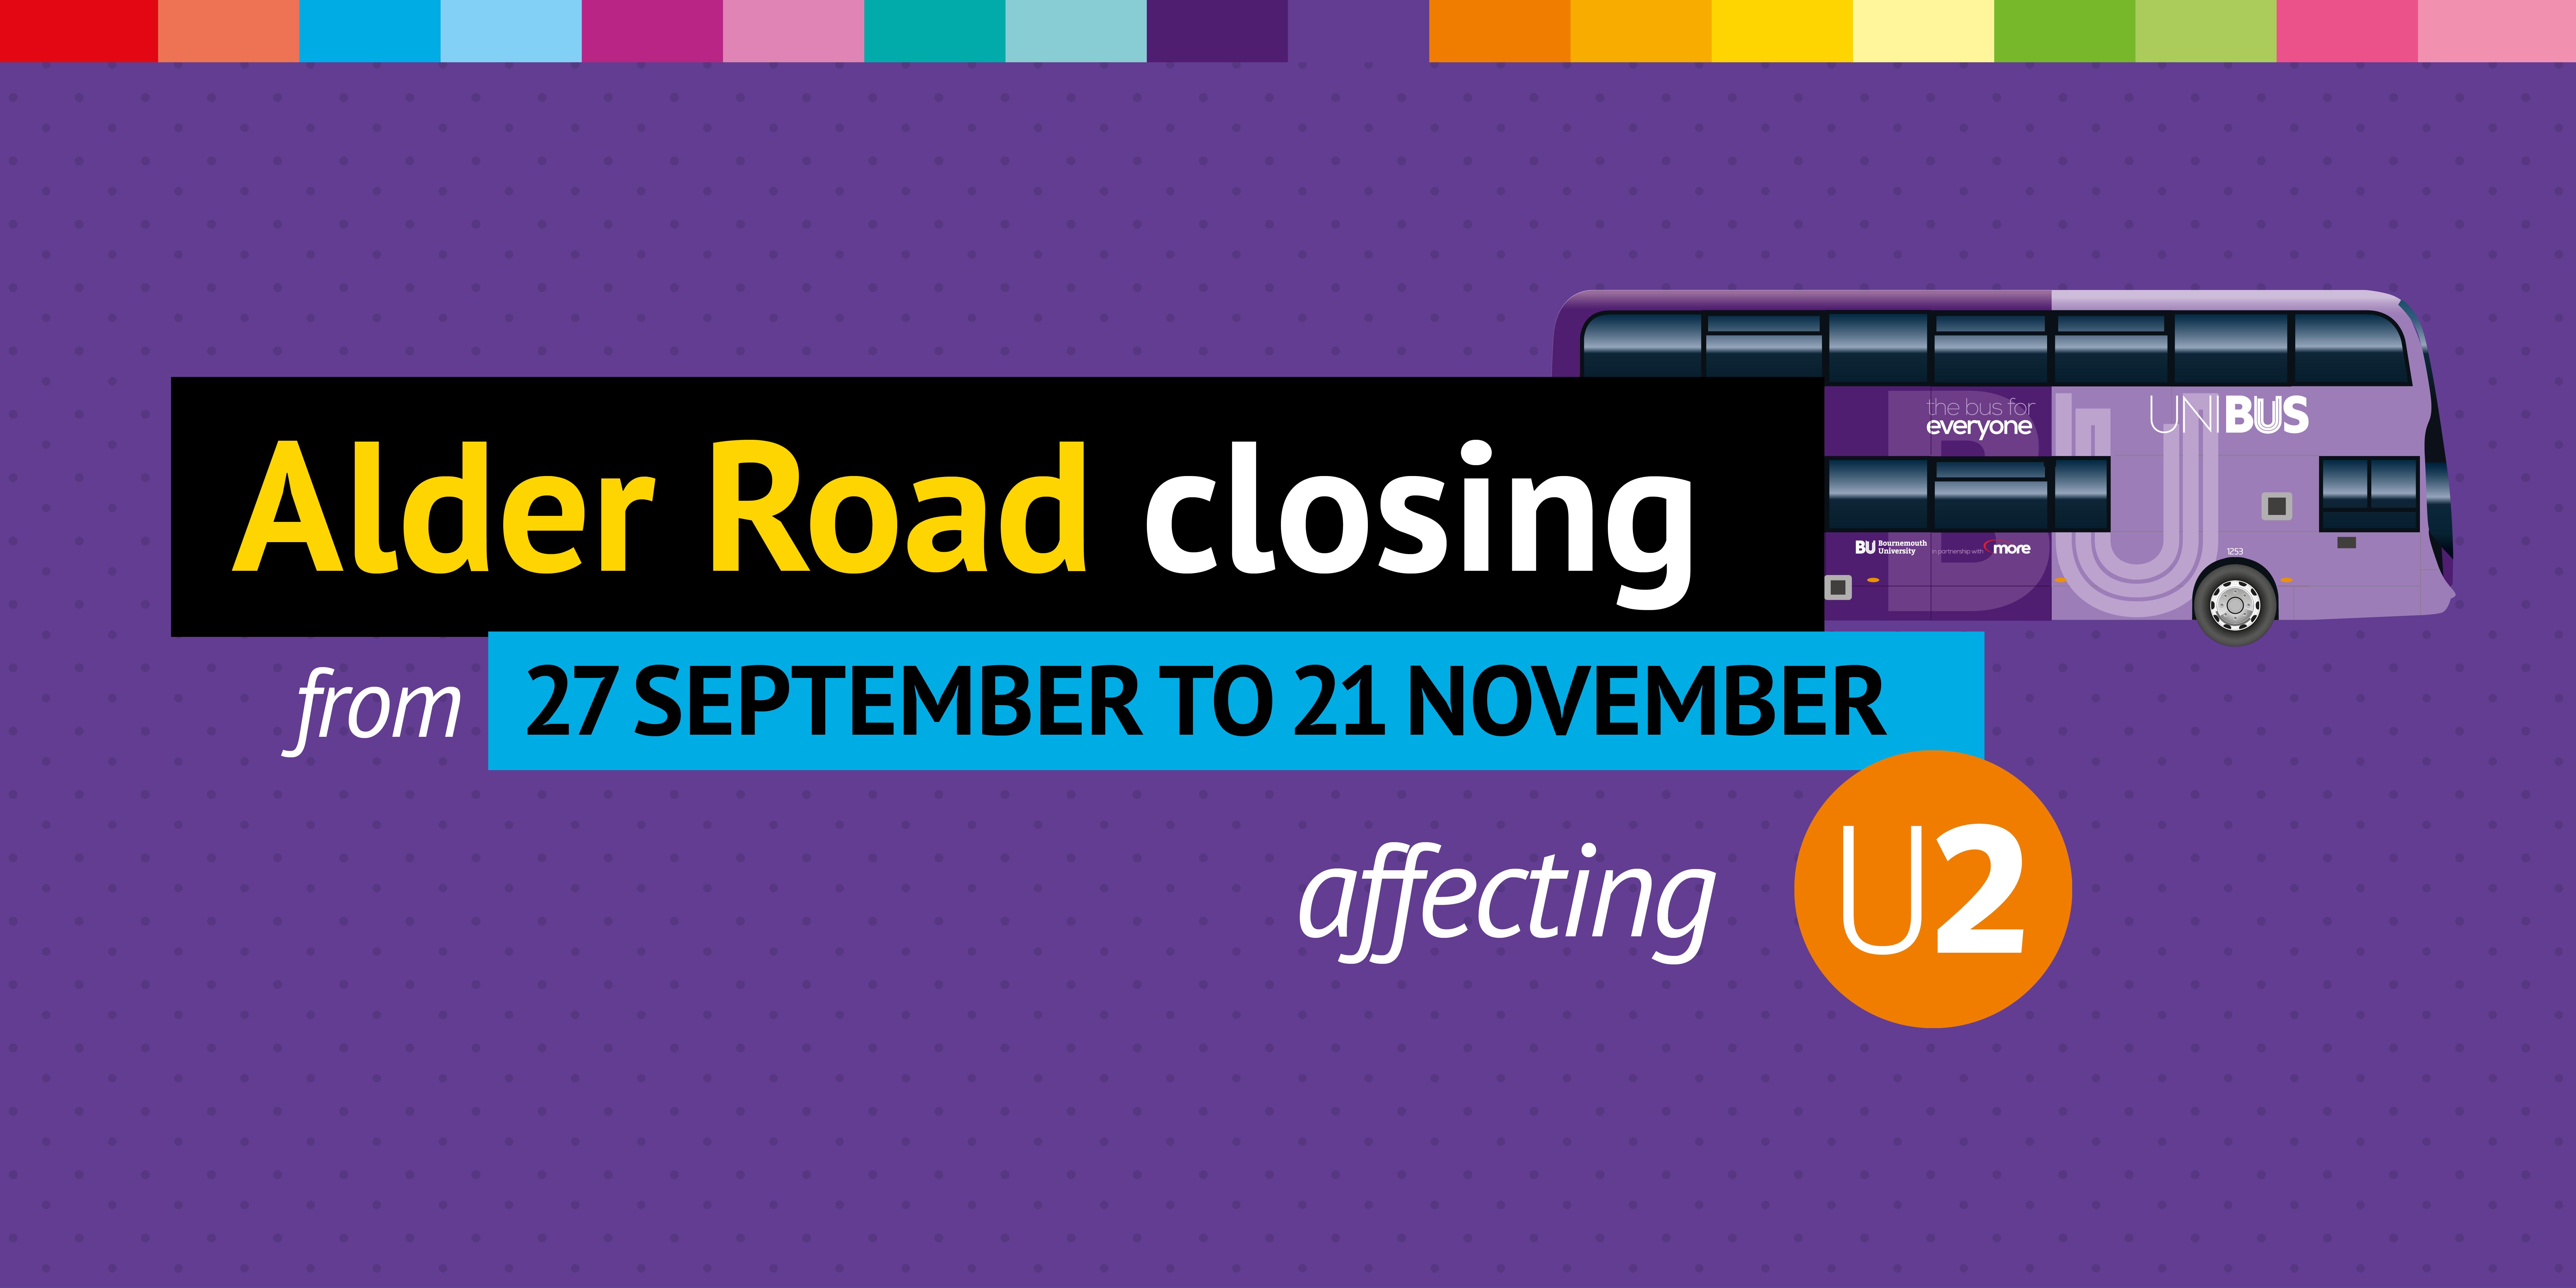 alder road closing from 27 september until 21 november